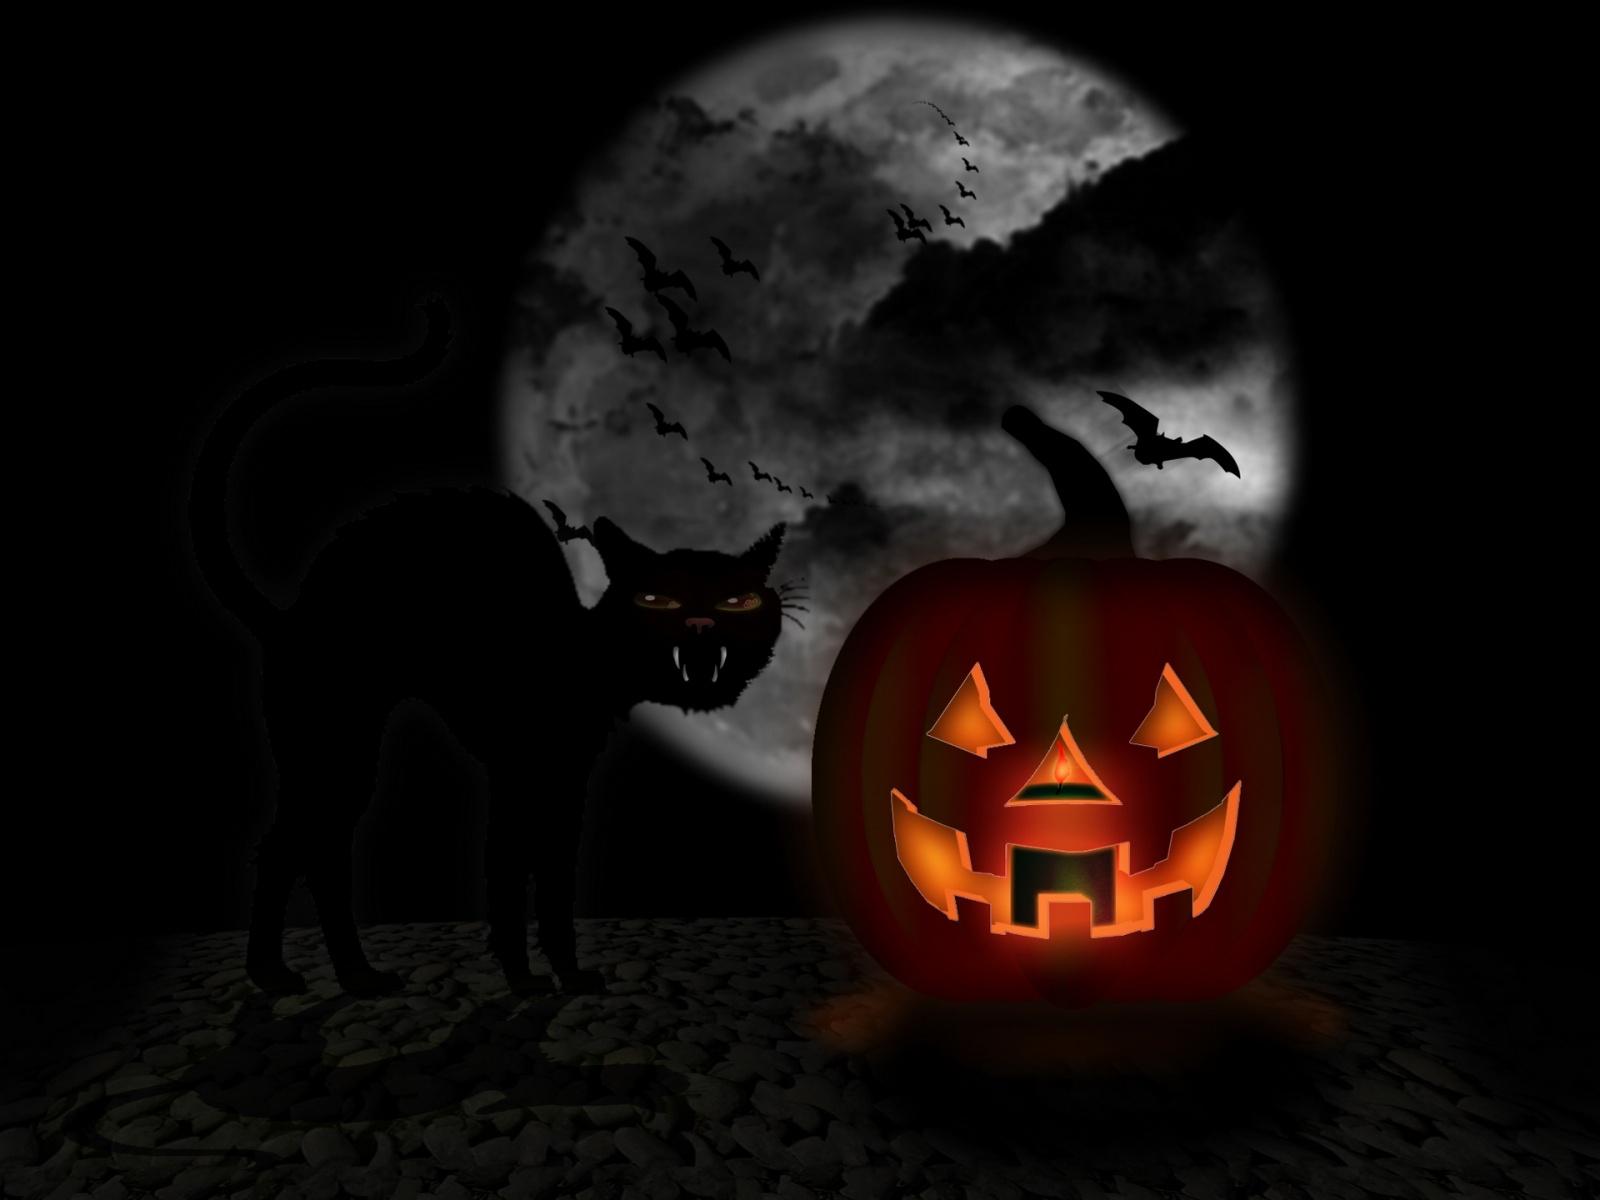 http://1.bp.blogspot.com/_Y8dVgrlzuG0/S60vxEgdYbI/AAAAAAAAHYc/ISJy2Q3PsAk/s1600/halloween+5.jpg